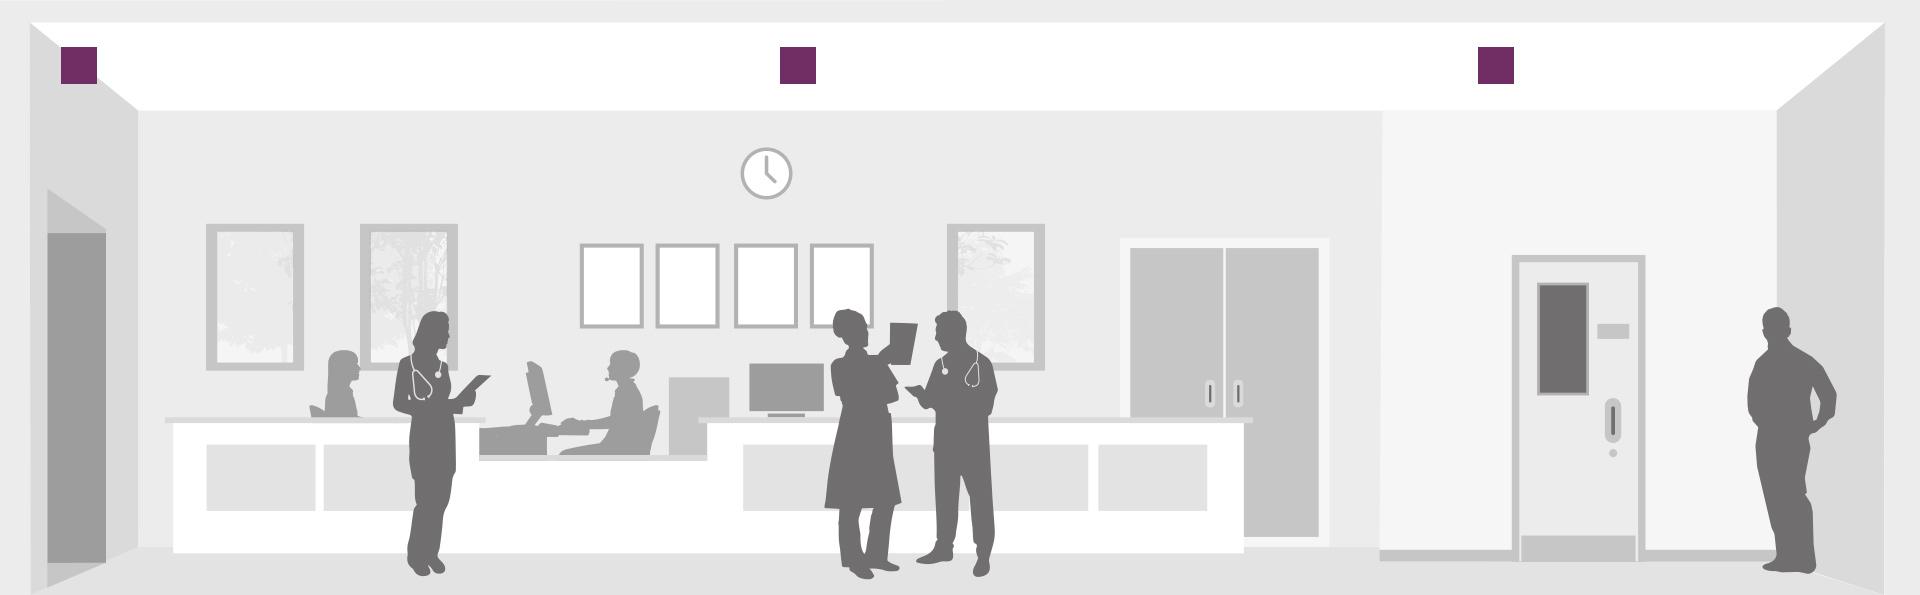 Designplan_Lighting_Guide_Secure_Health_Nursestations